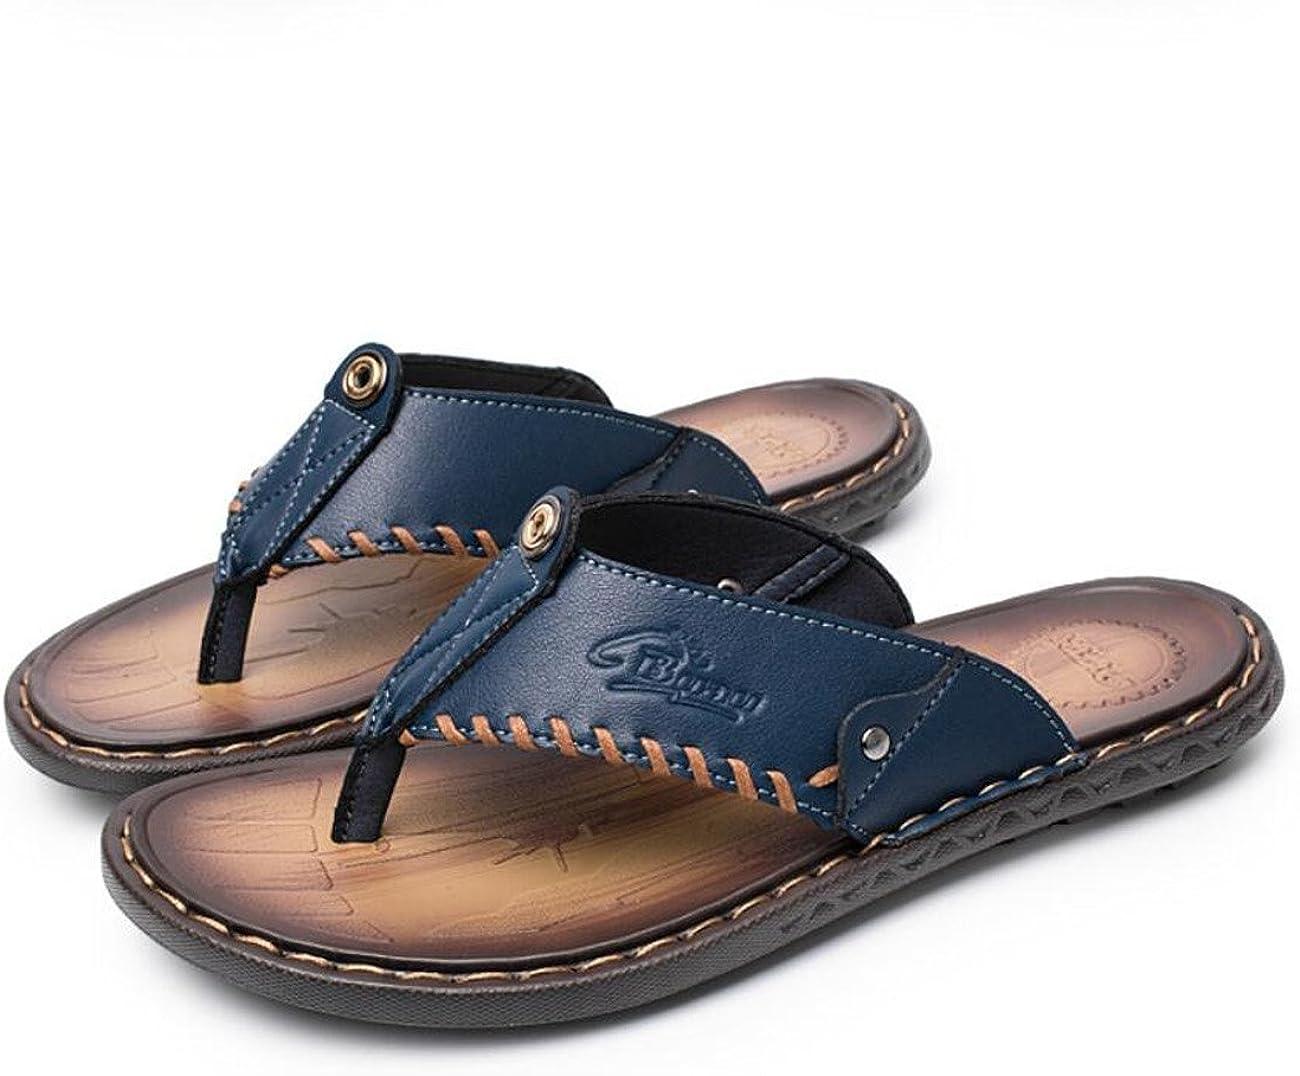 DANDANJIE Mens Lightweight Slide Slippers Waterproof Flip Flops for Home Beach Swimming Pool Sandals Outdoor Shoes